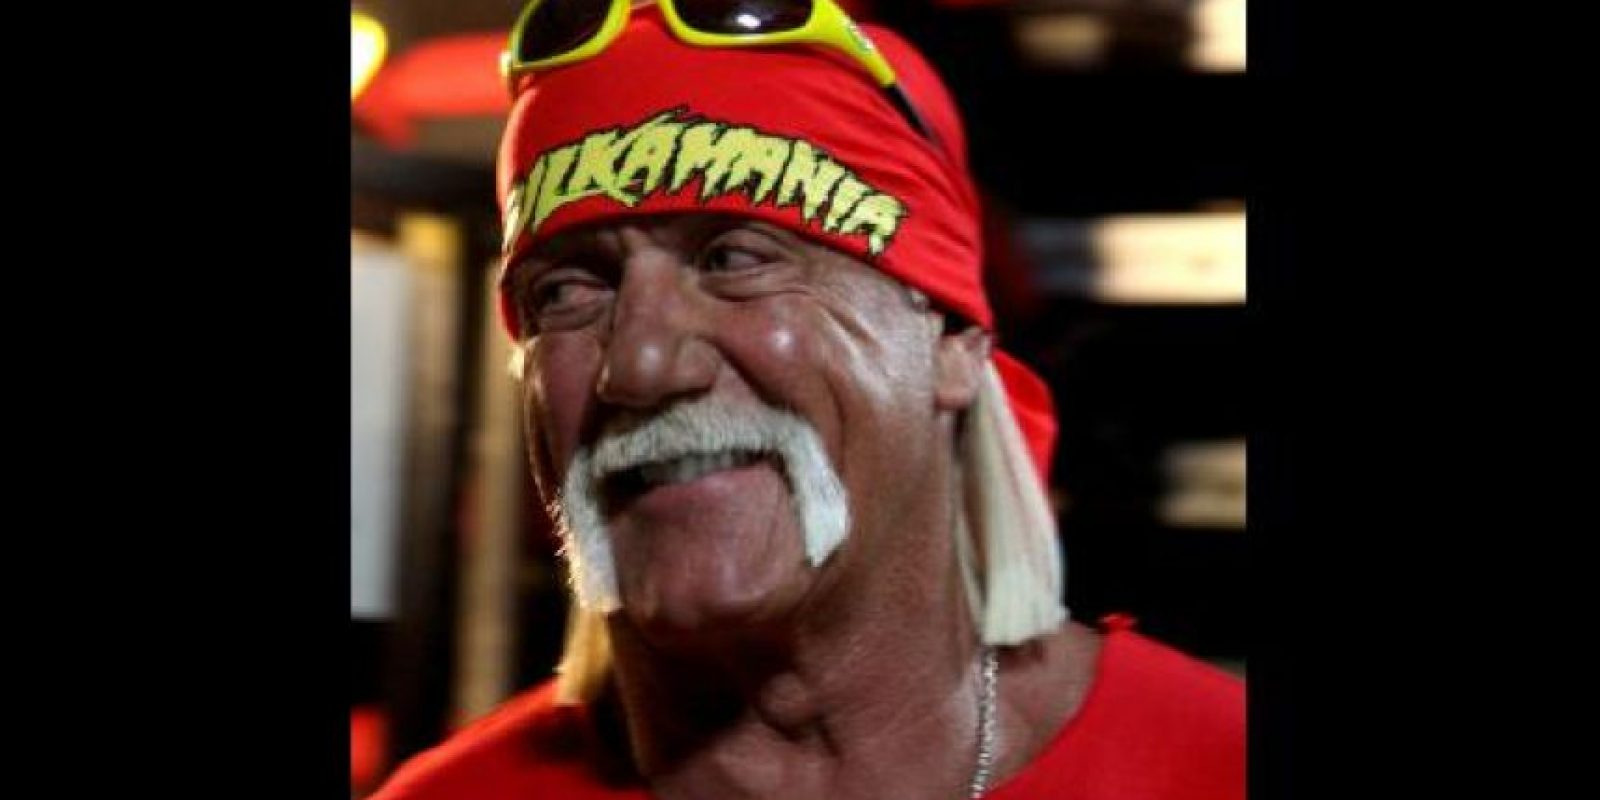 Se trata del legendario Hulk Hogan Foto:WWE